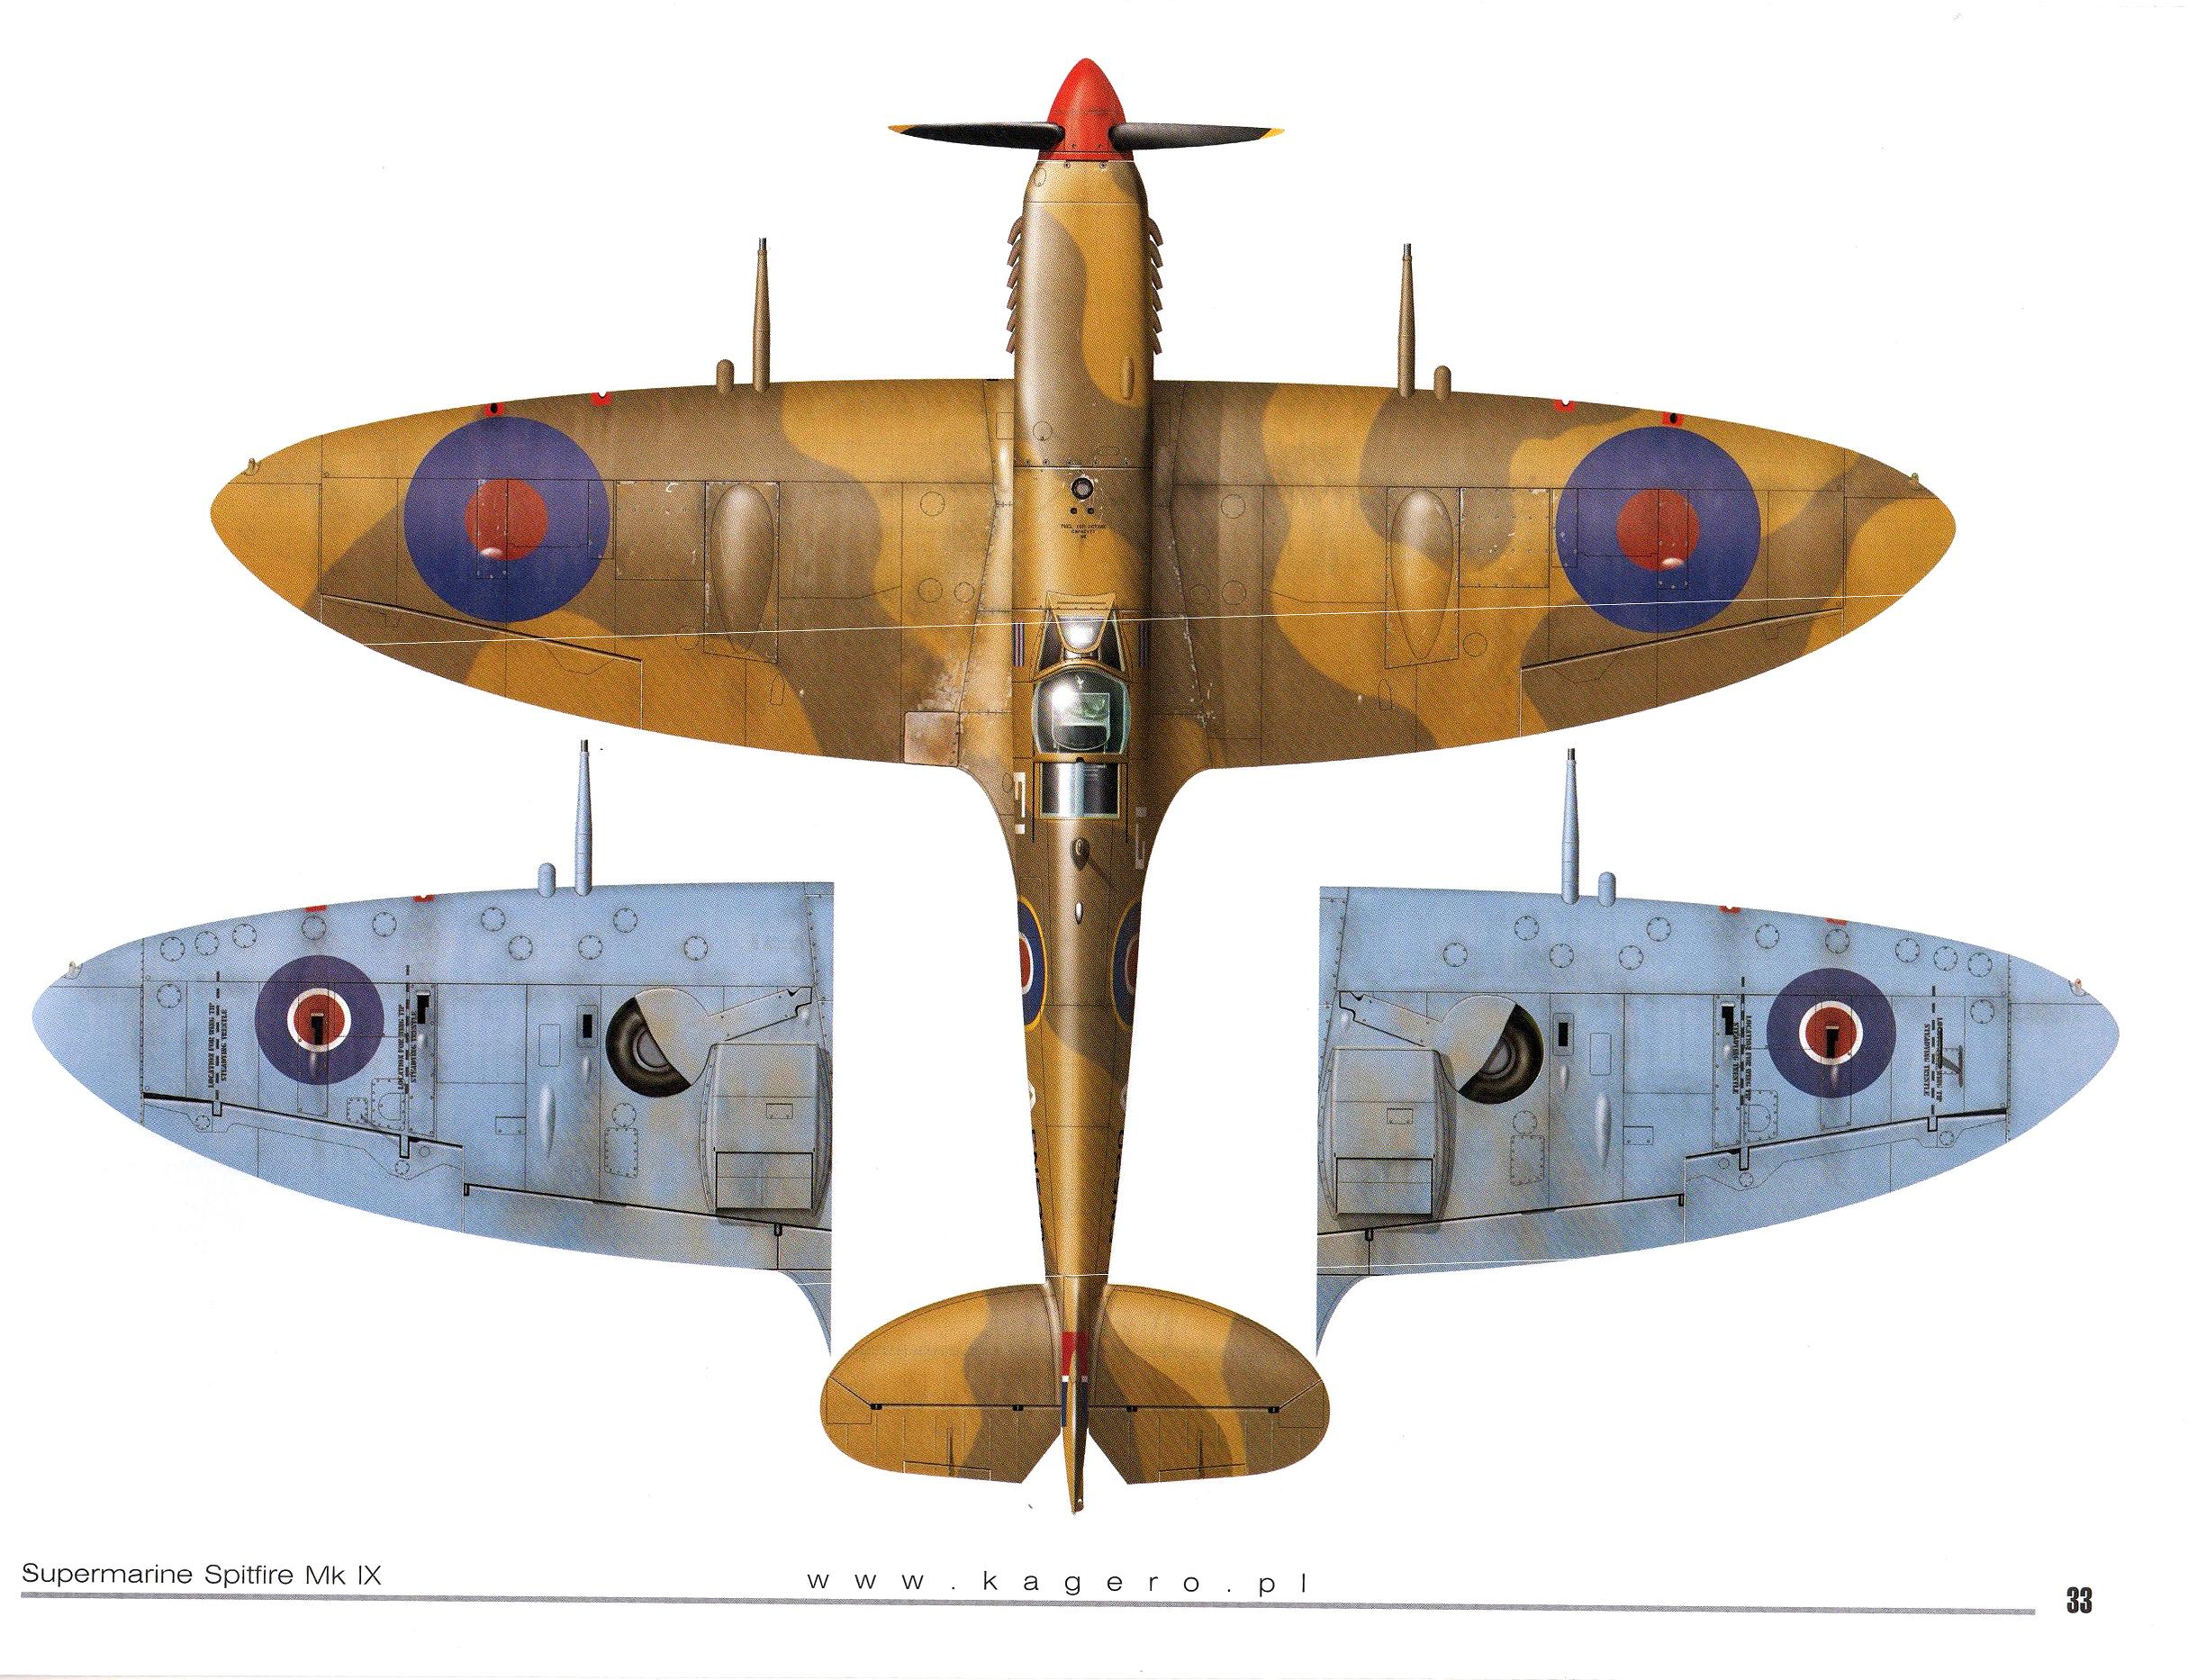 Spitfire MkIXc RAF 81Sqn FLA Colin Gray EN520 TC15015 Supermarine Spitfire MkIX Page 29